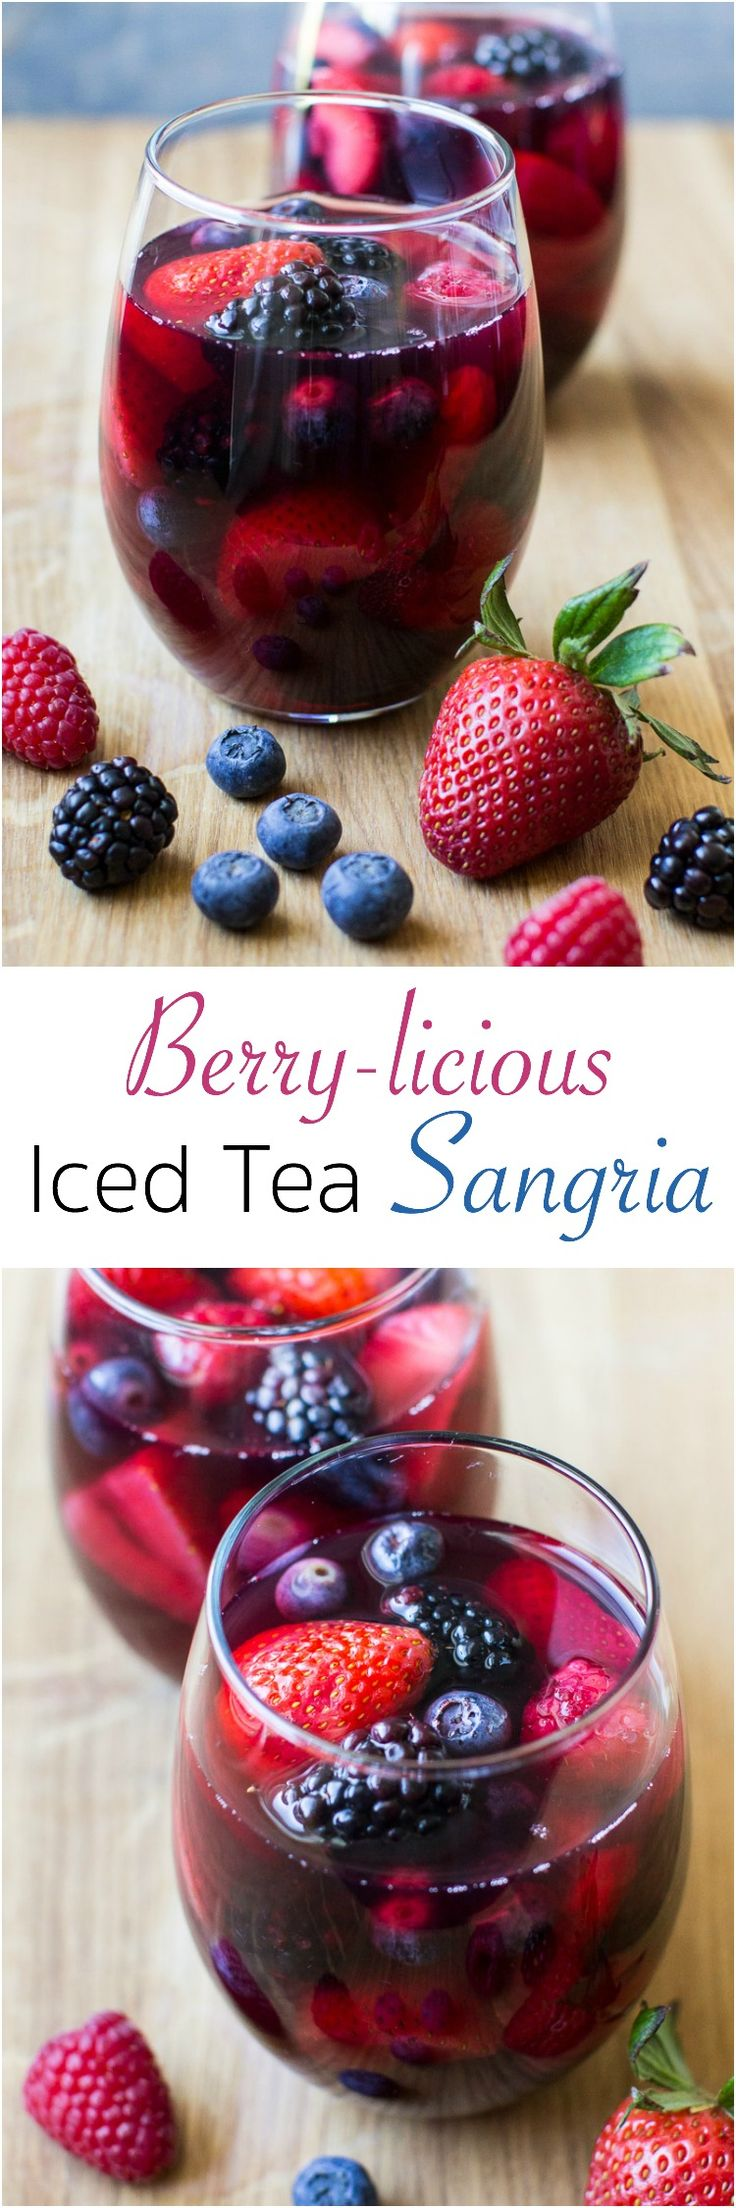 Berry-licious Iced Tea Red Sangria